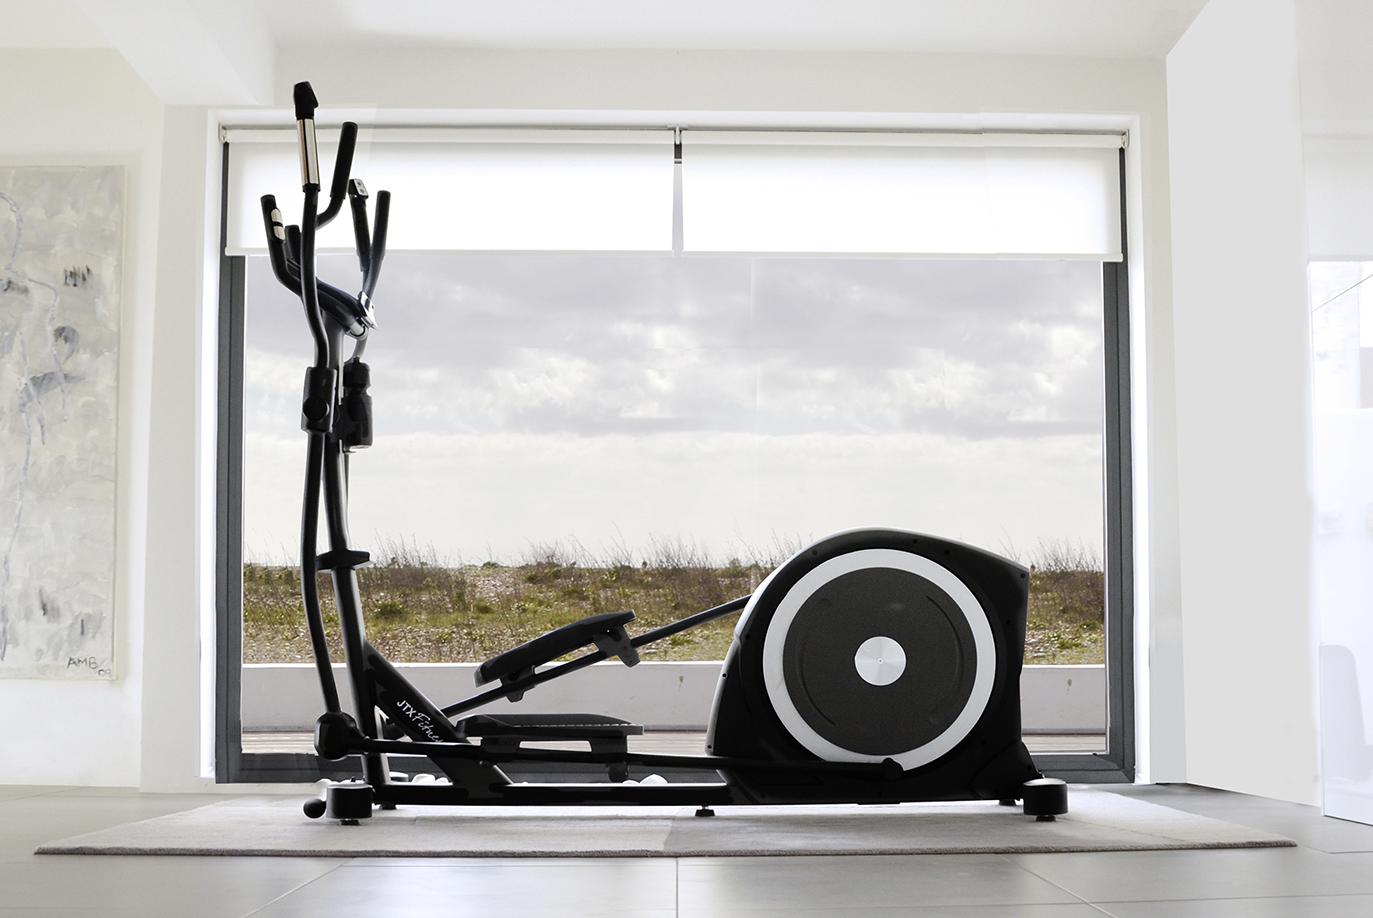 JTX Zenith: Gym Cross Trainer